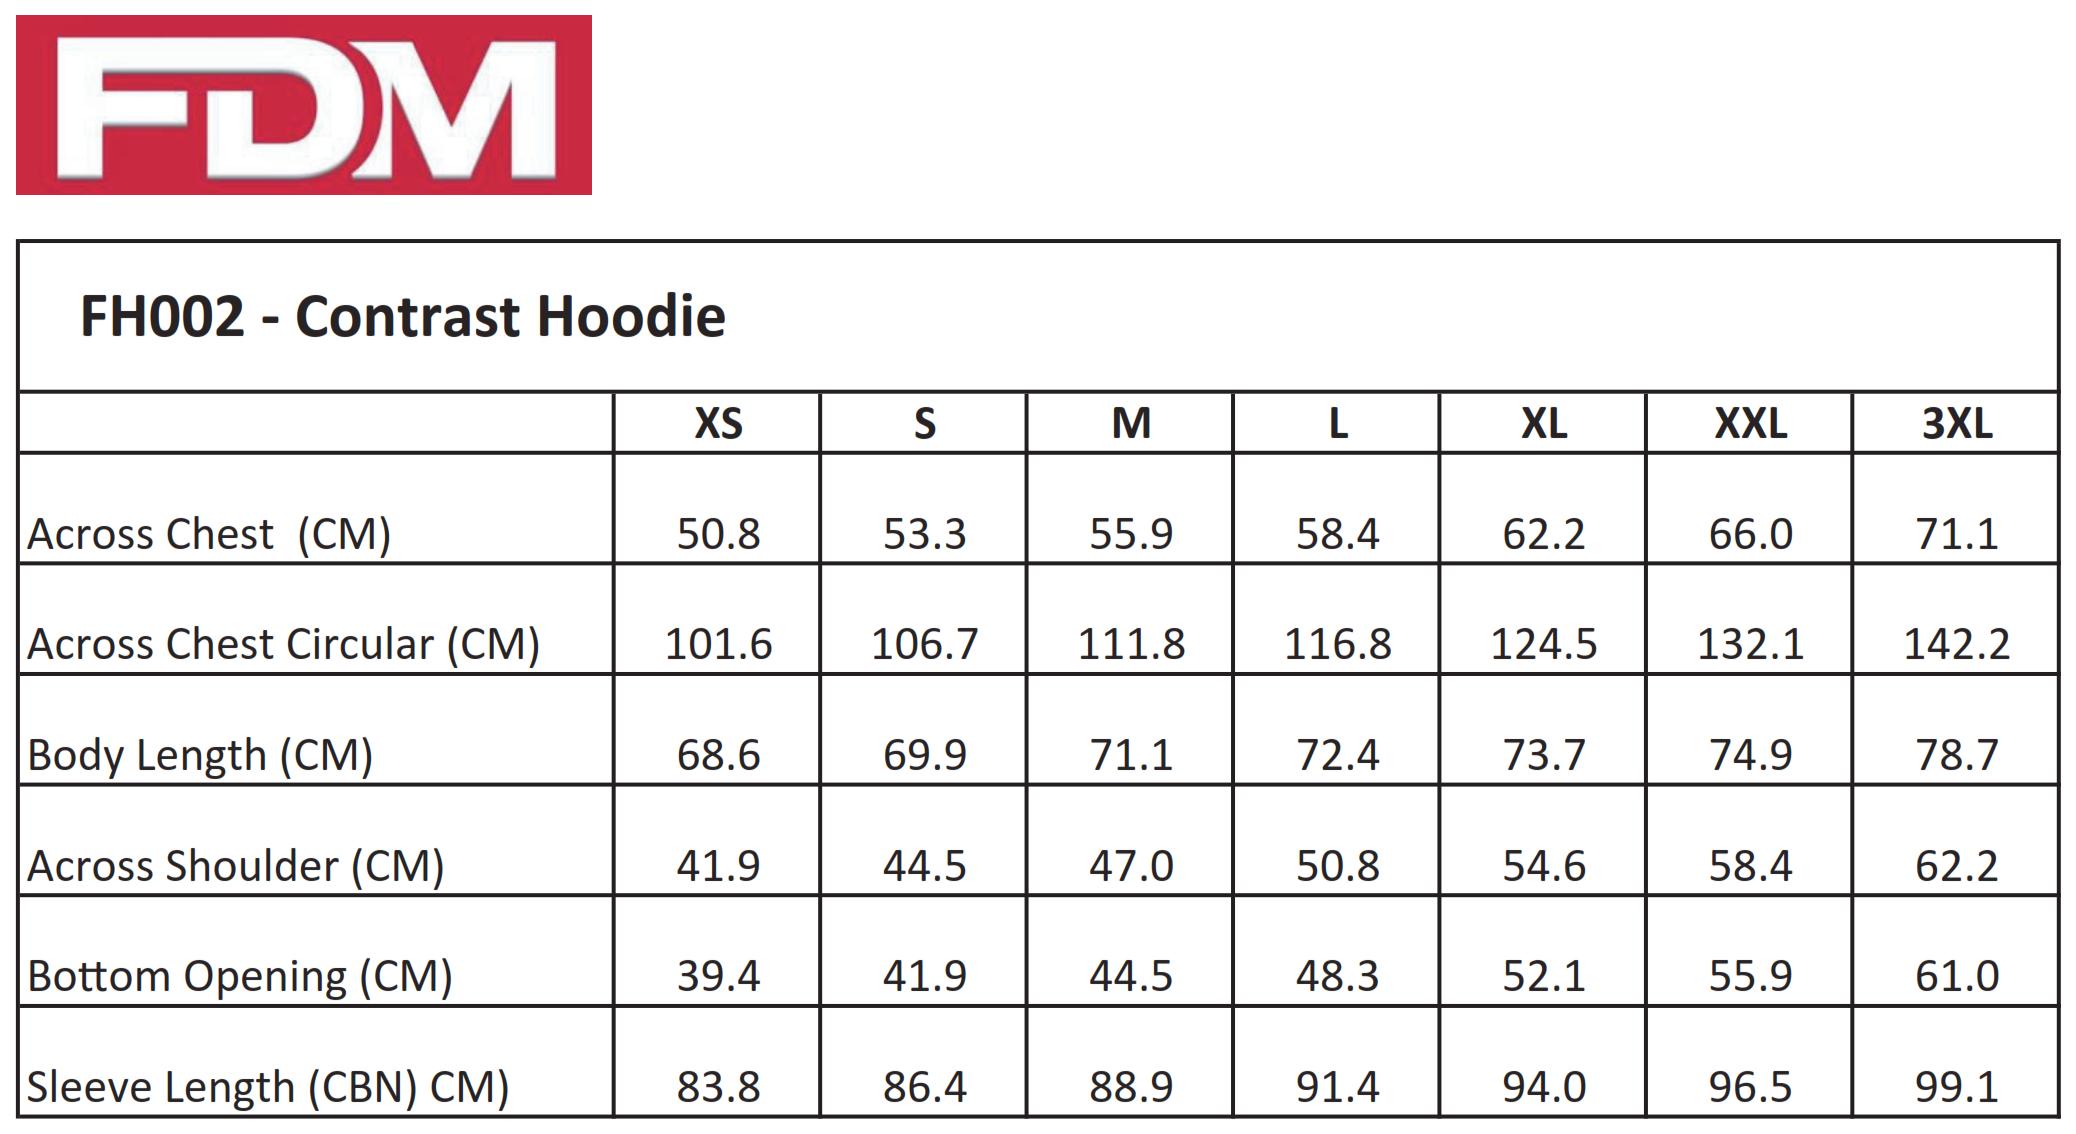 FDM: Contrast Hoodie FH002